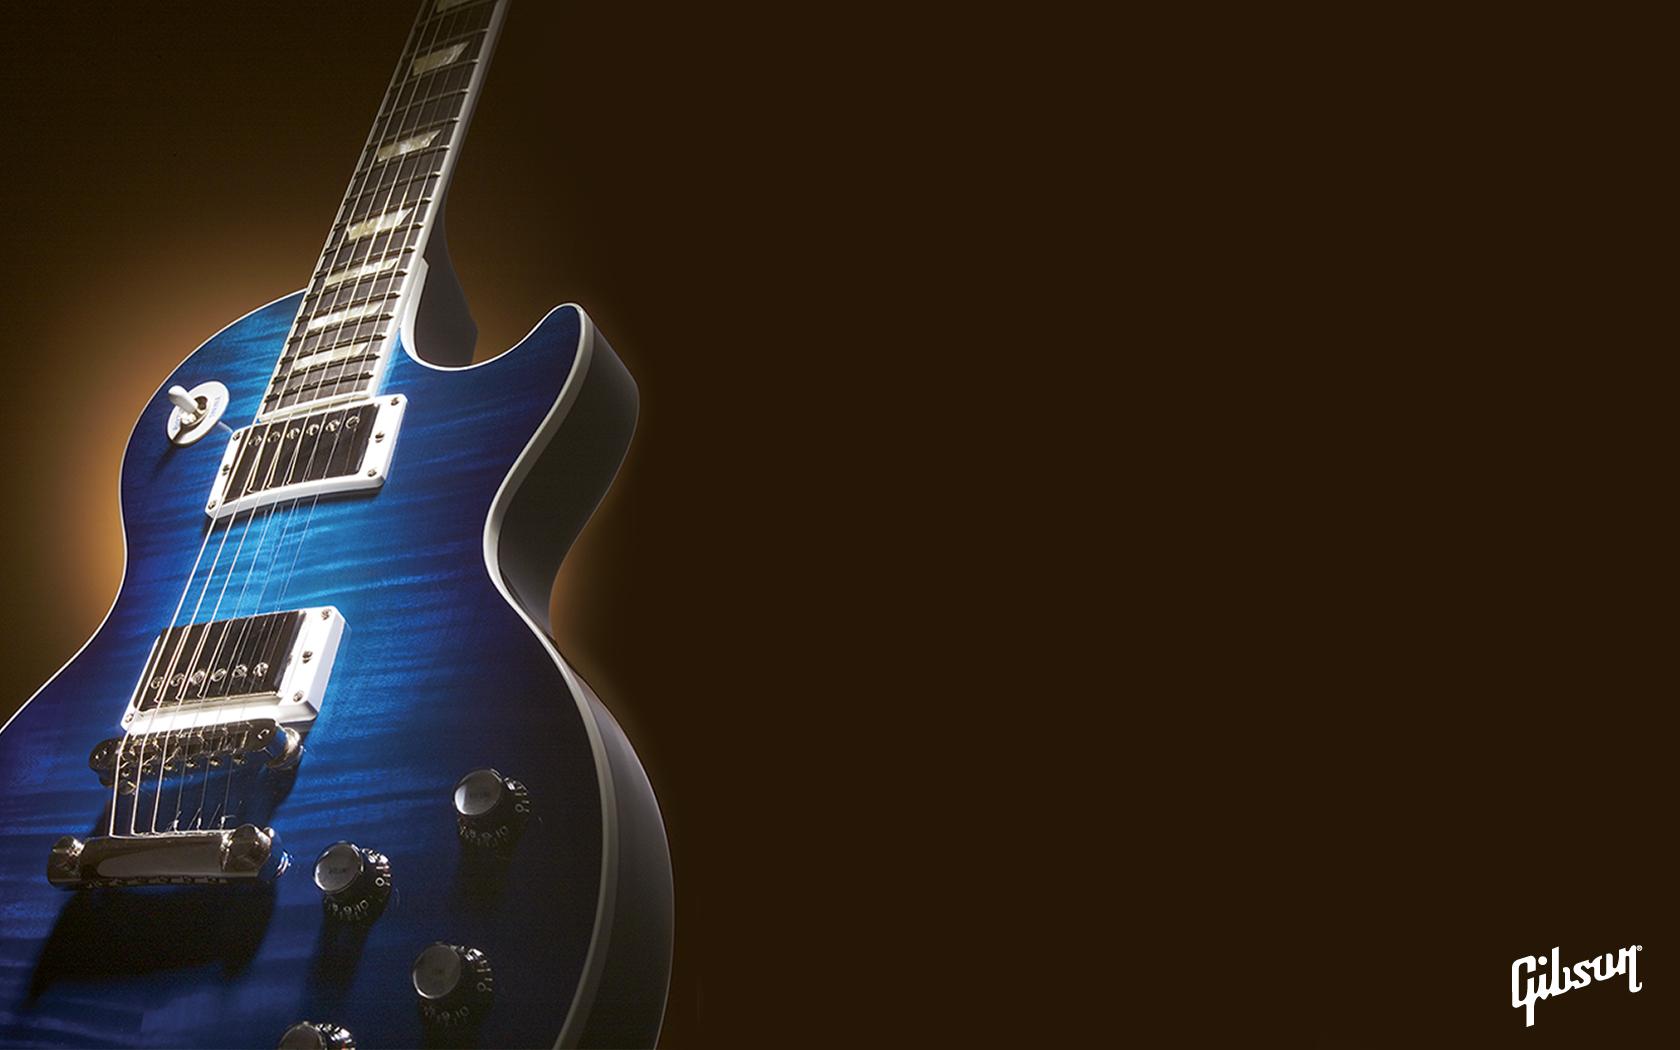 Gibson Guitars Wallpaper 1680x1050 Gibson Guitars Electric Guitars 1680x1050